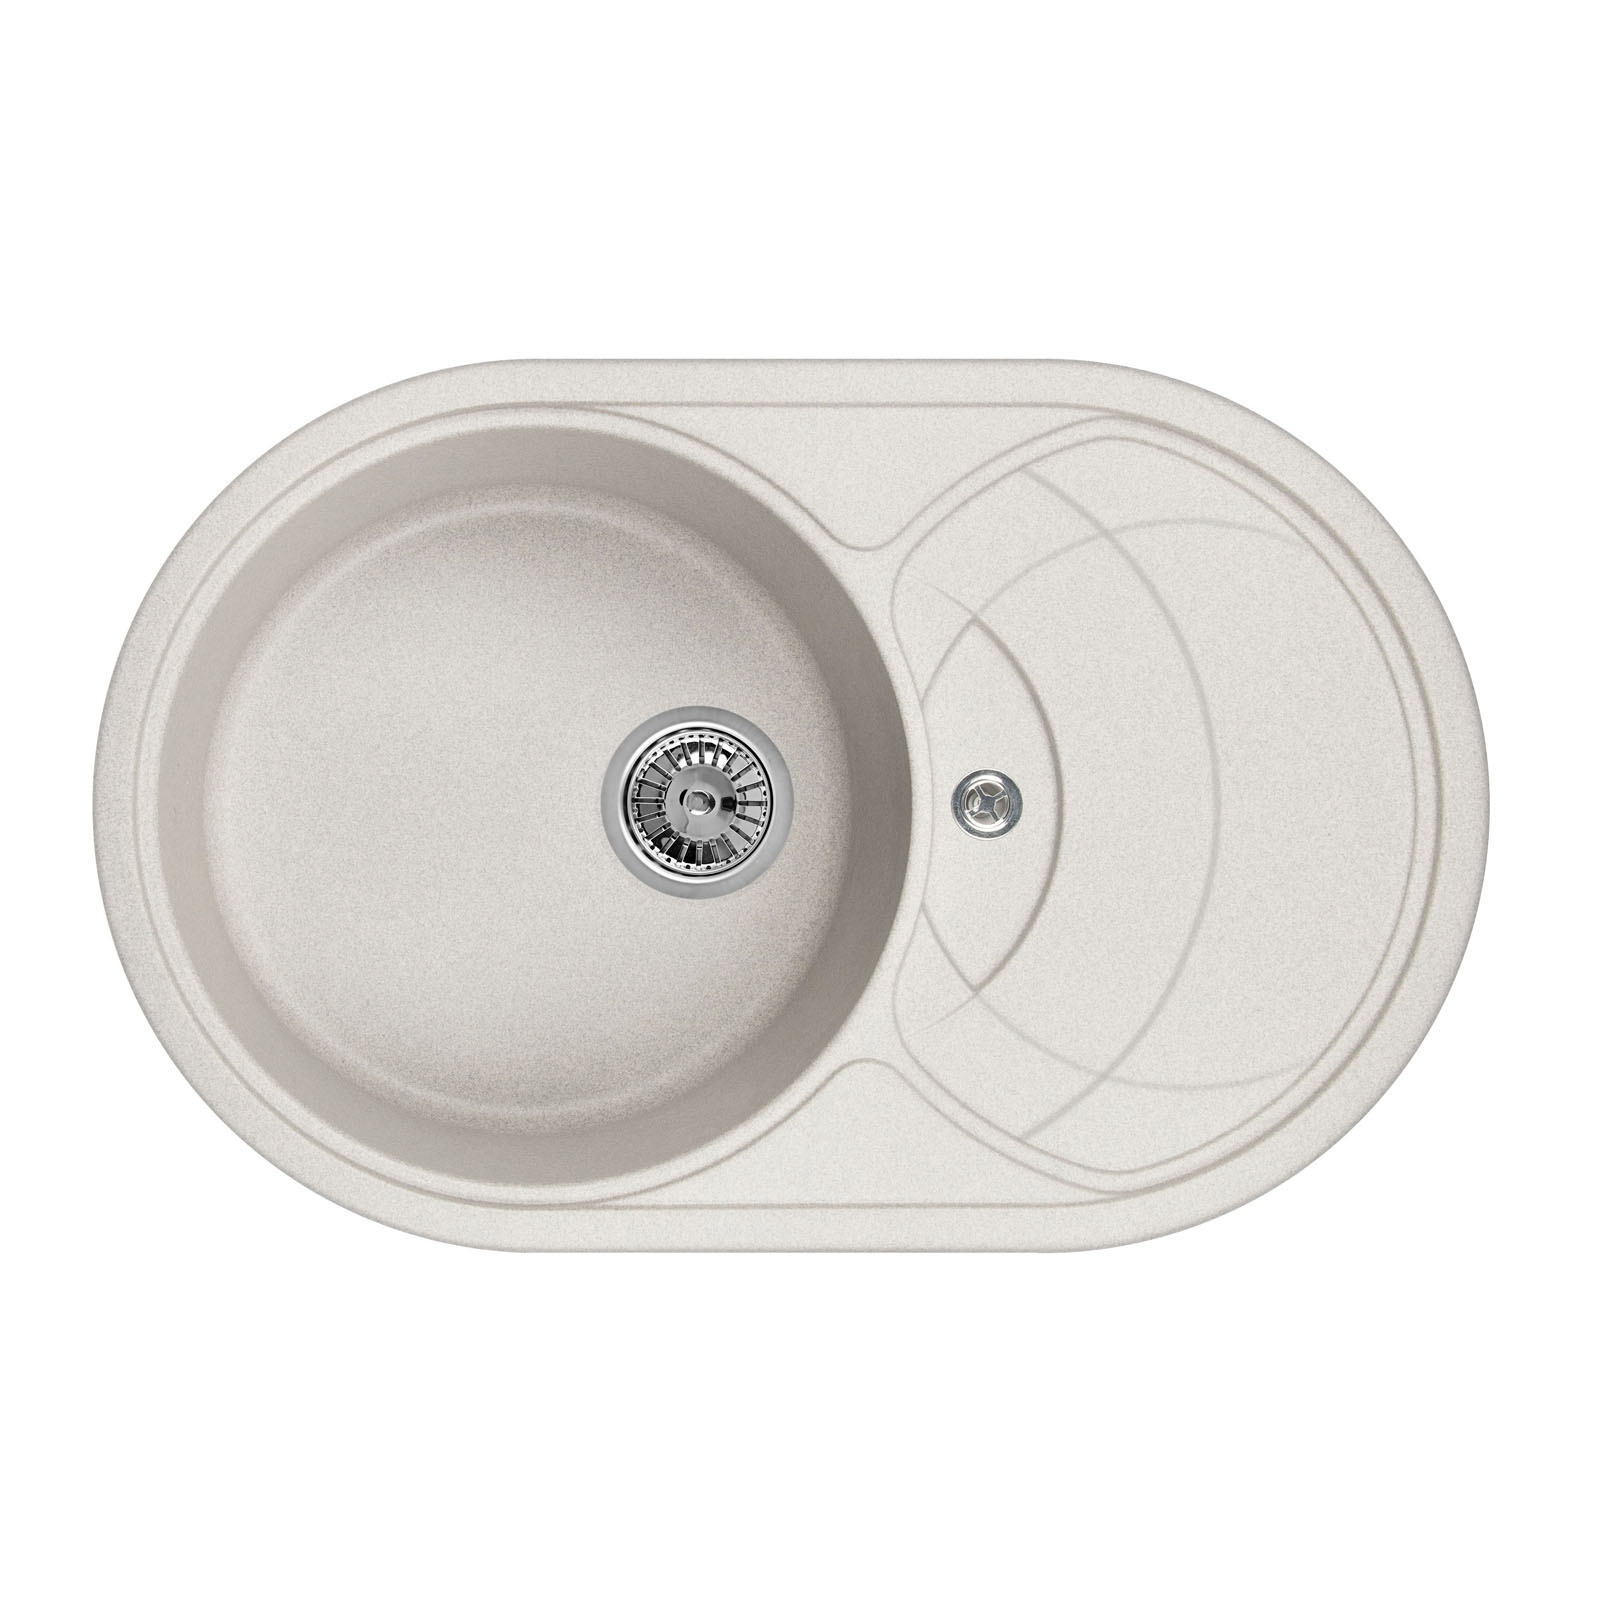 Кухонная мойка Granula GR-7801 775х495 базальт кухонная мойка teka classic 1b 1 2d microtex